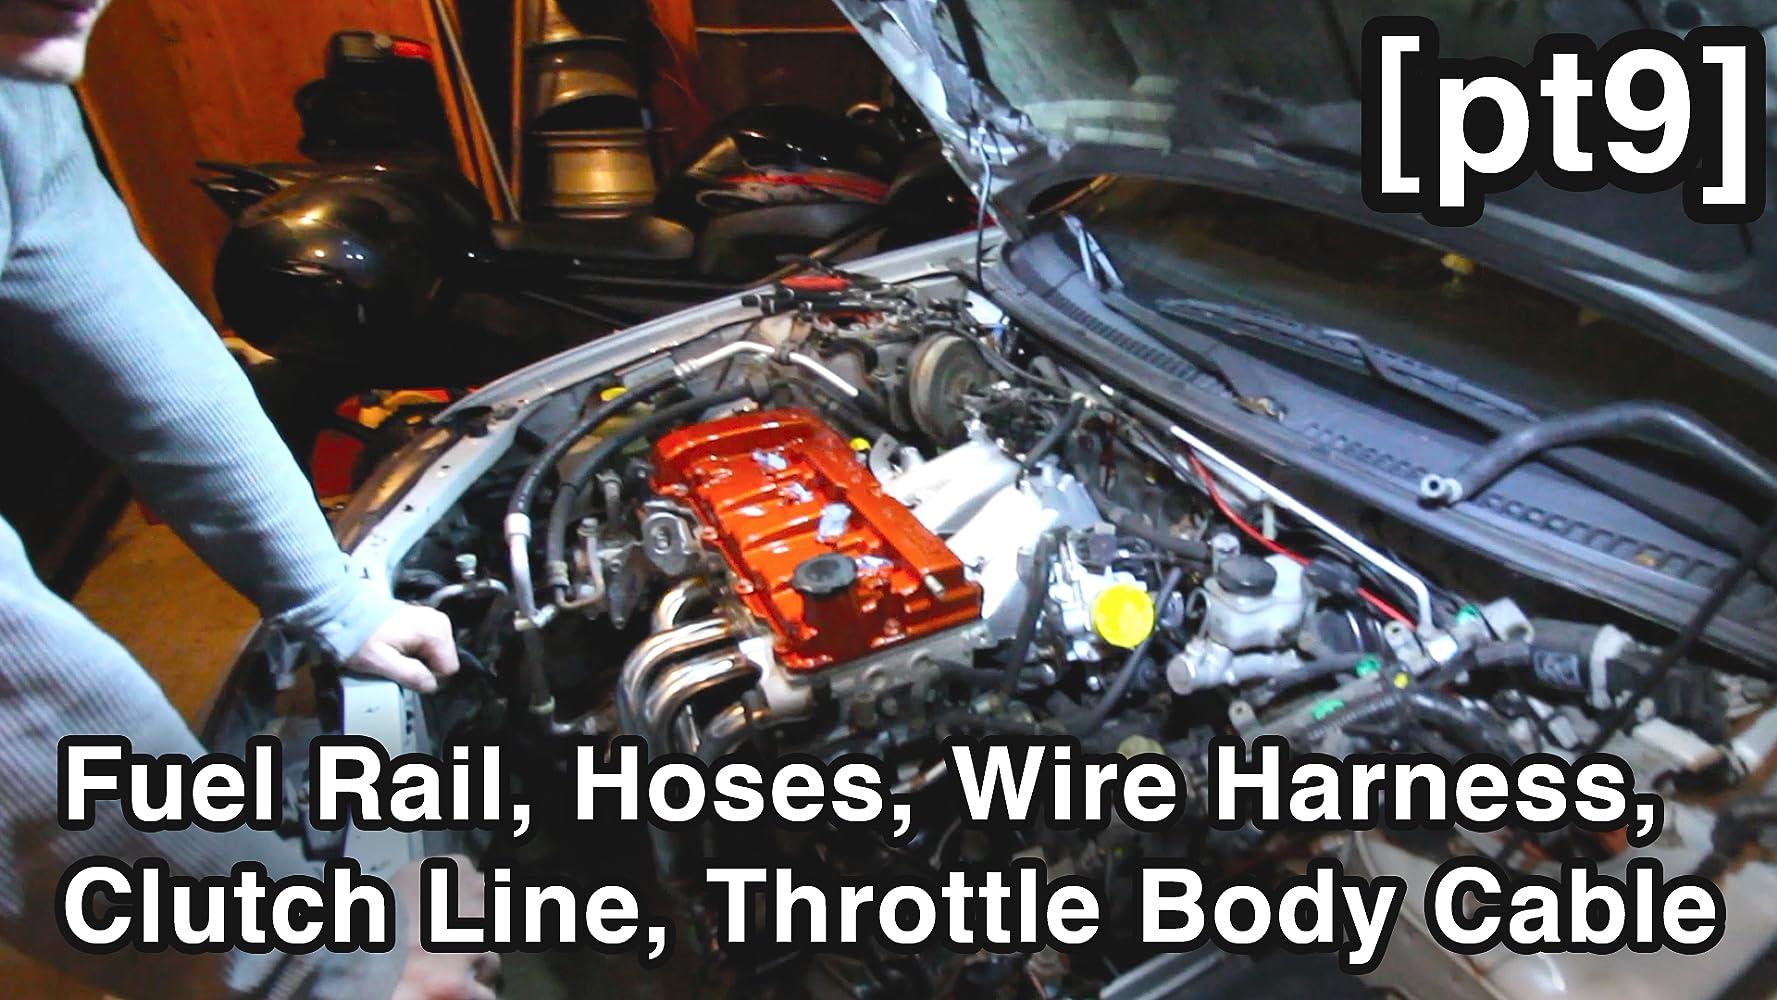 Mercedes Benz Wiring Harness Rebuild Schematics Diagrams Vacuum Coolant Hoses Fuel Rail Wire Throttle Body Cable Rh Imdb Com 2004 C320 Engine Repair